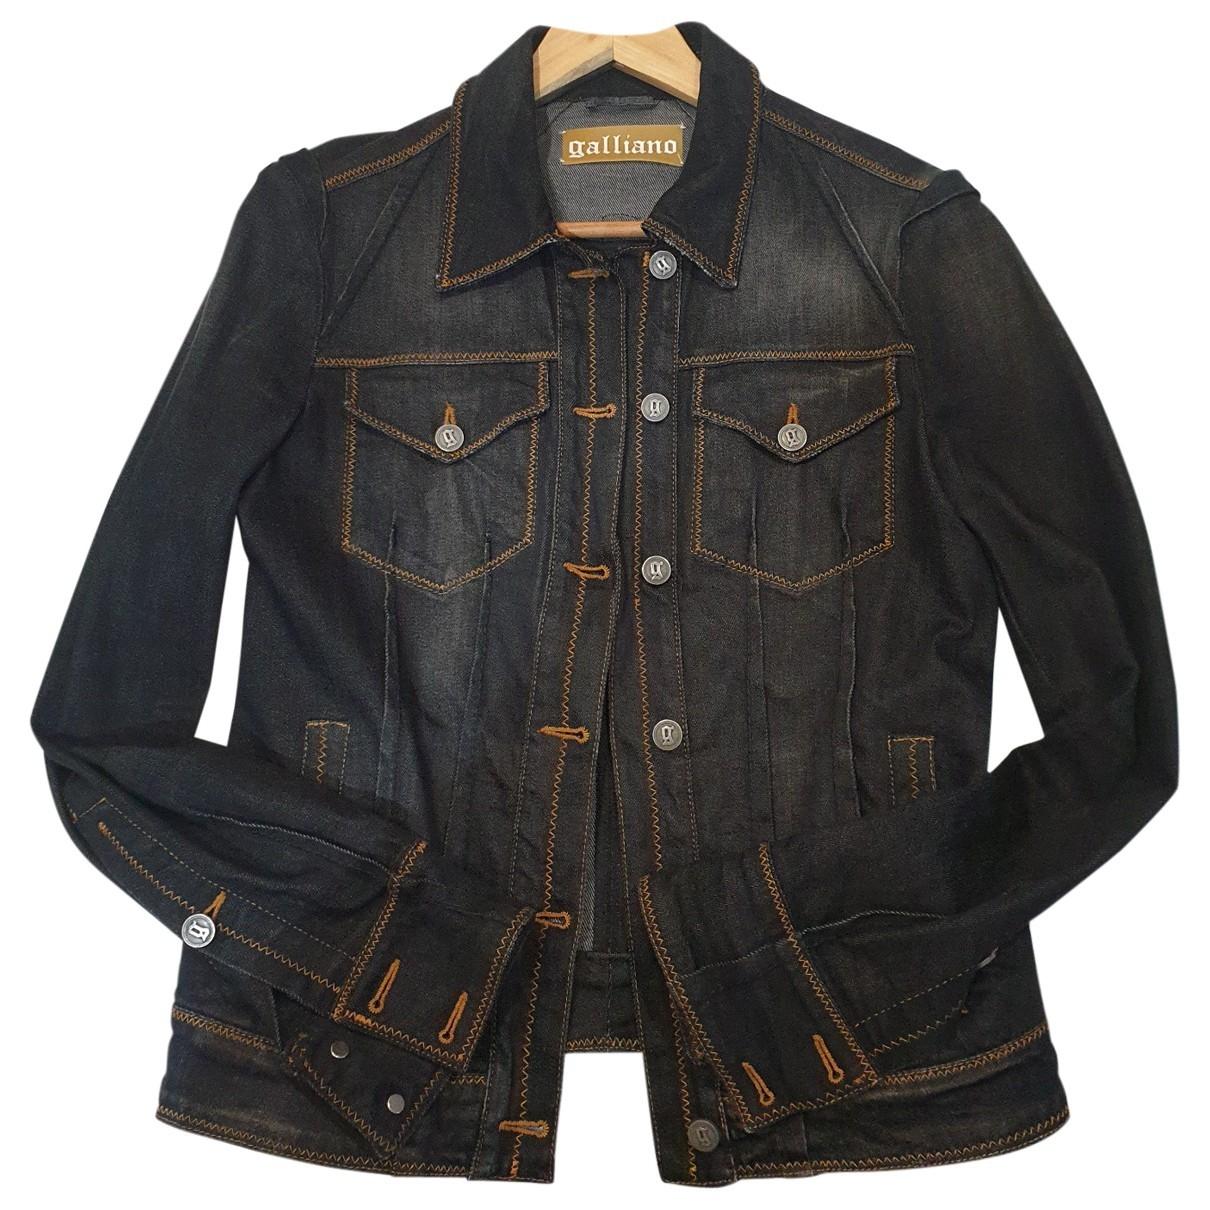 Galliano \N Black Cotton jacket for Women 42 IT